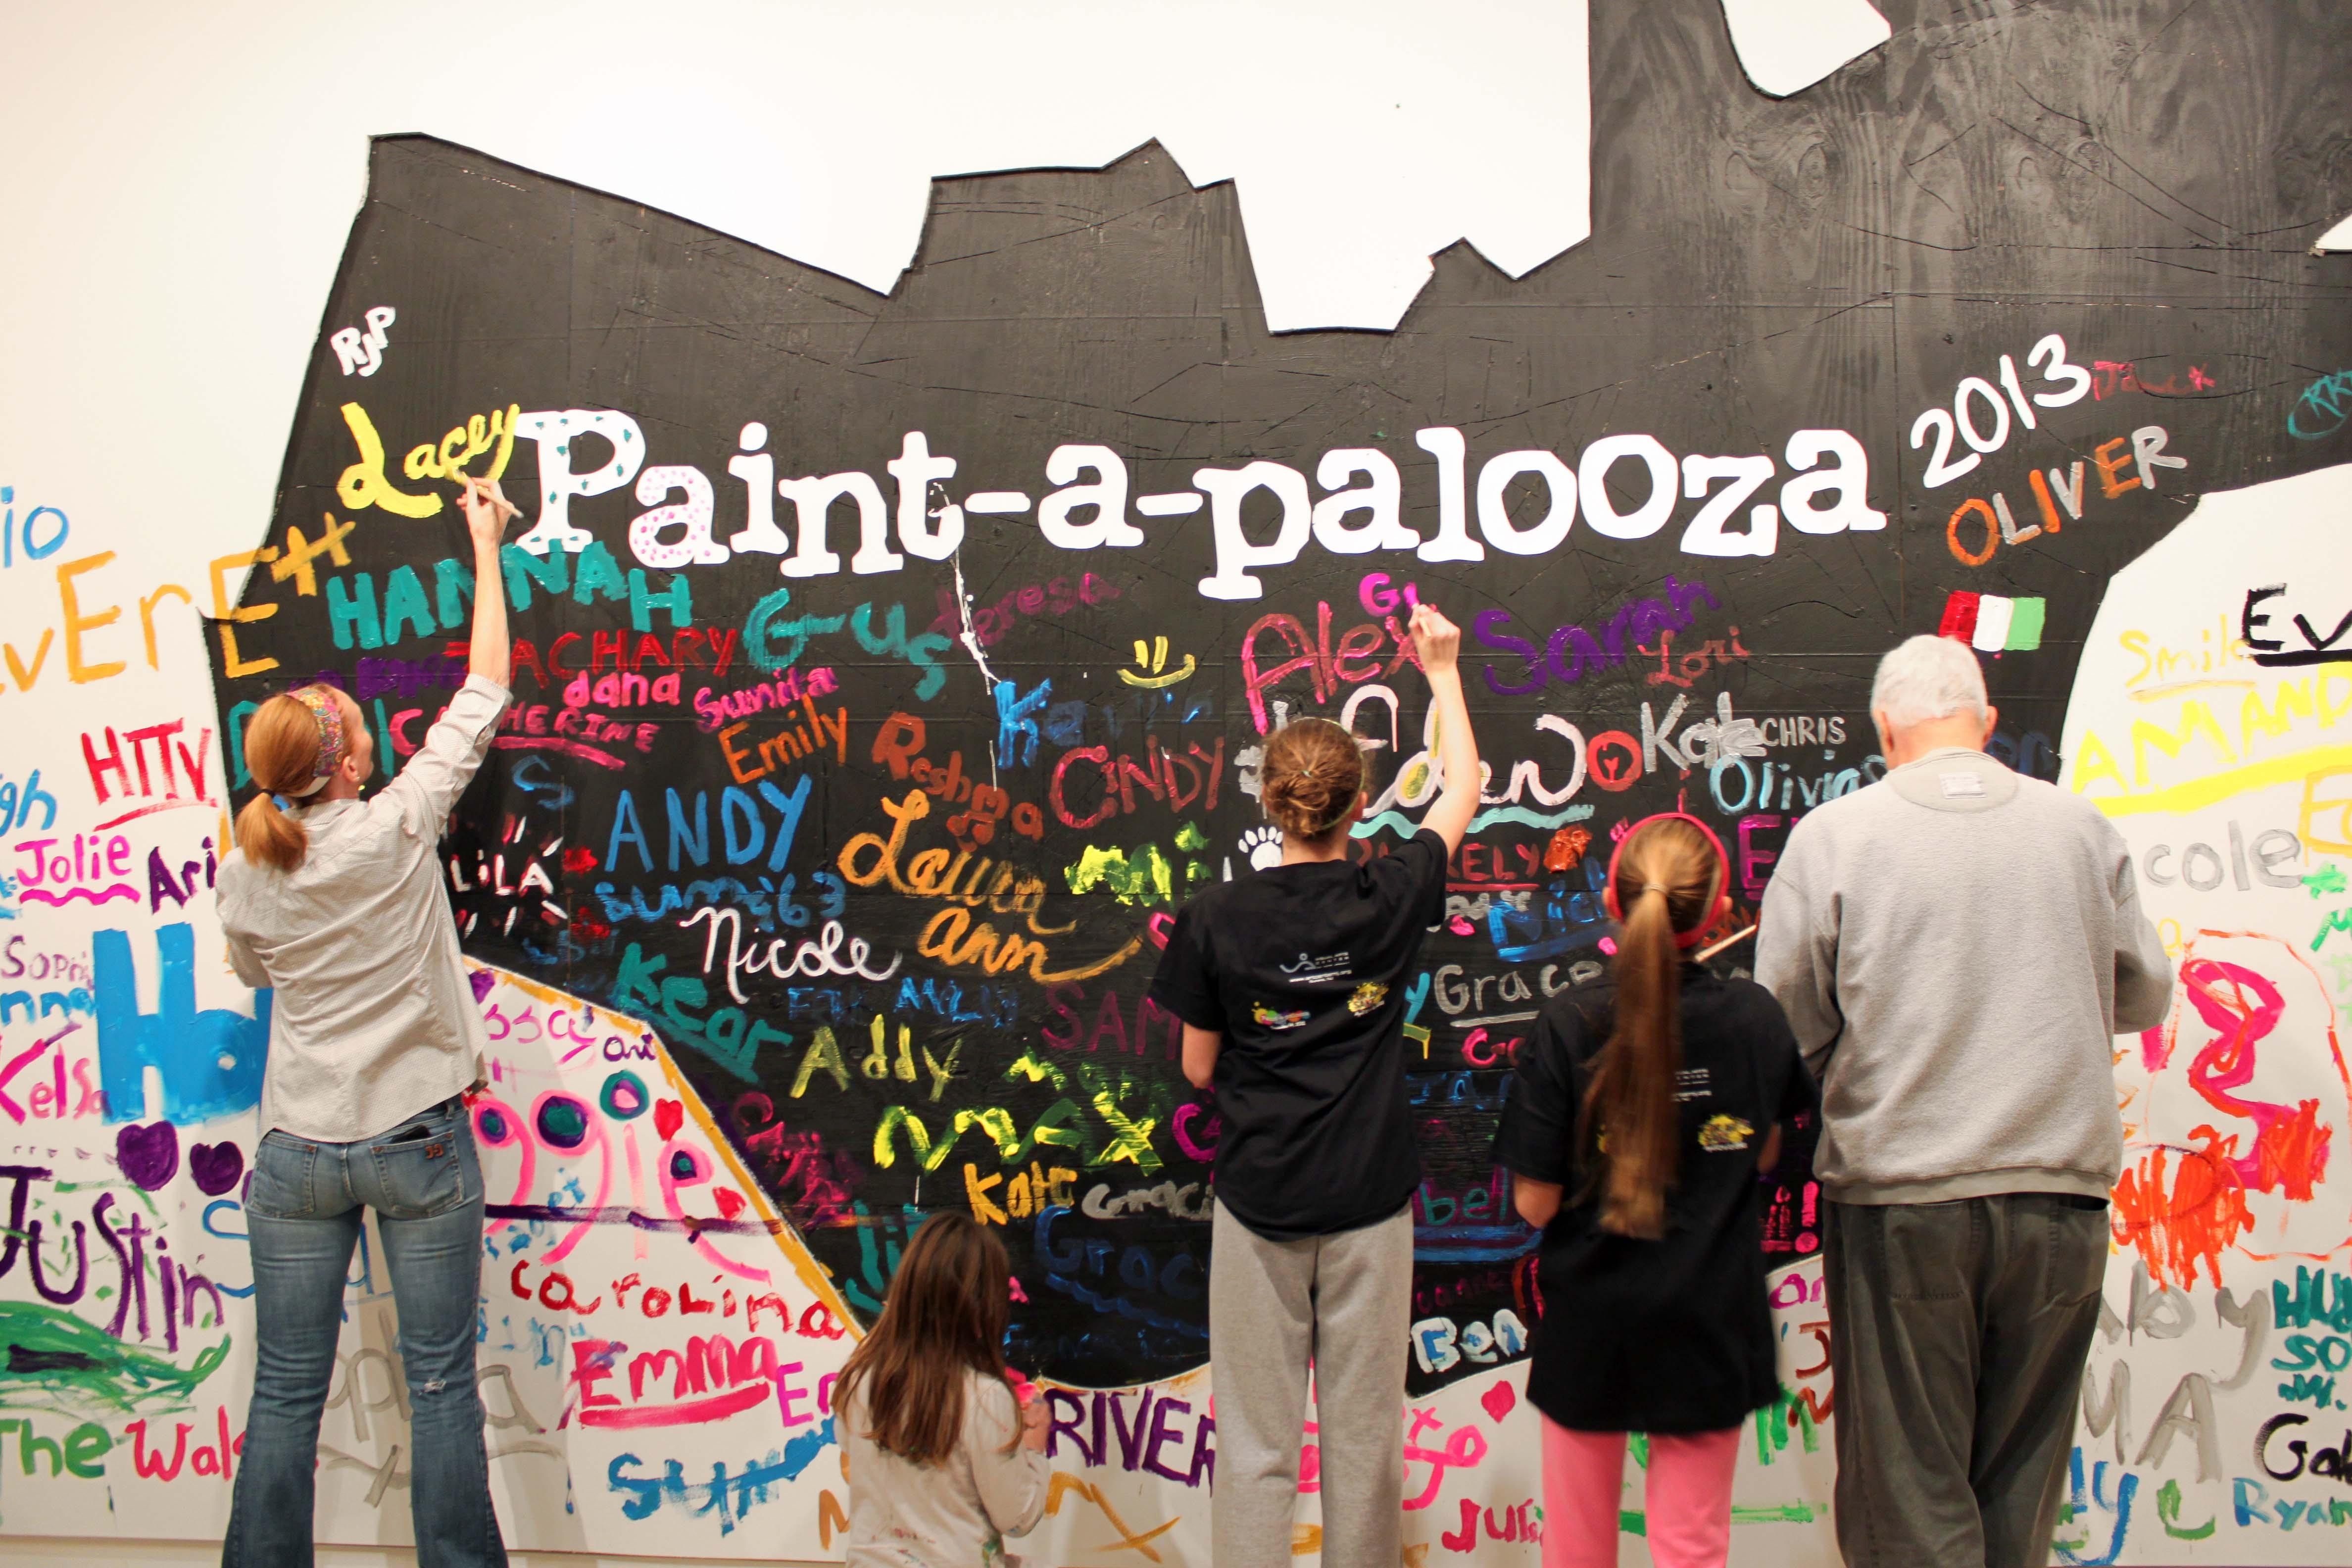 0eba17d534ef19293e99_Paint-a-palooza_2013_Sign.jpg